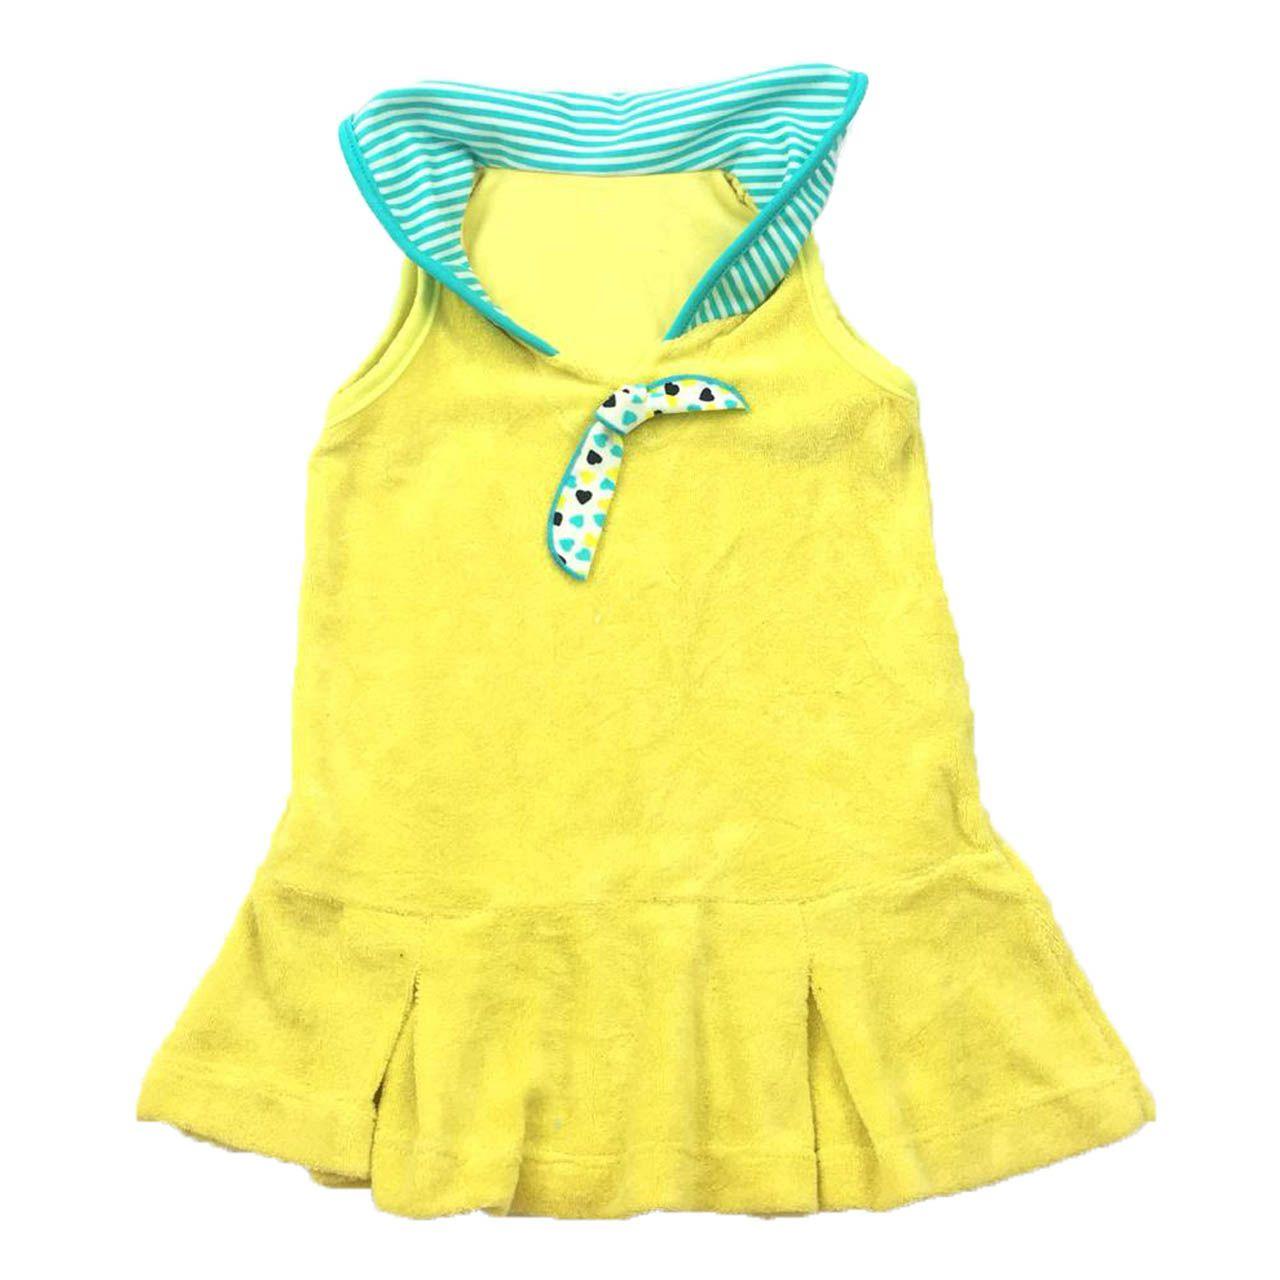 8544c5217 pirilampo roupas infantis